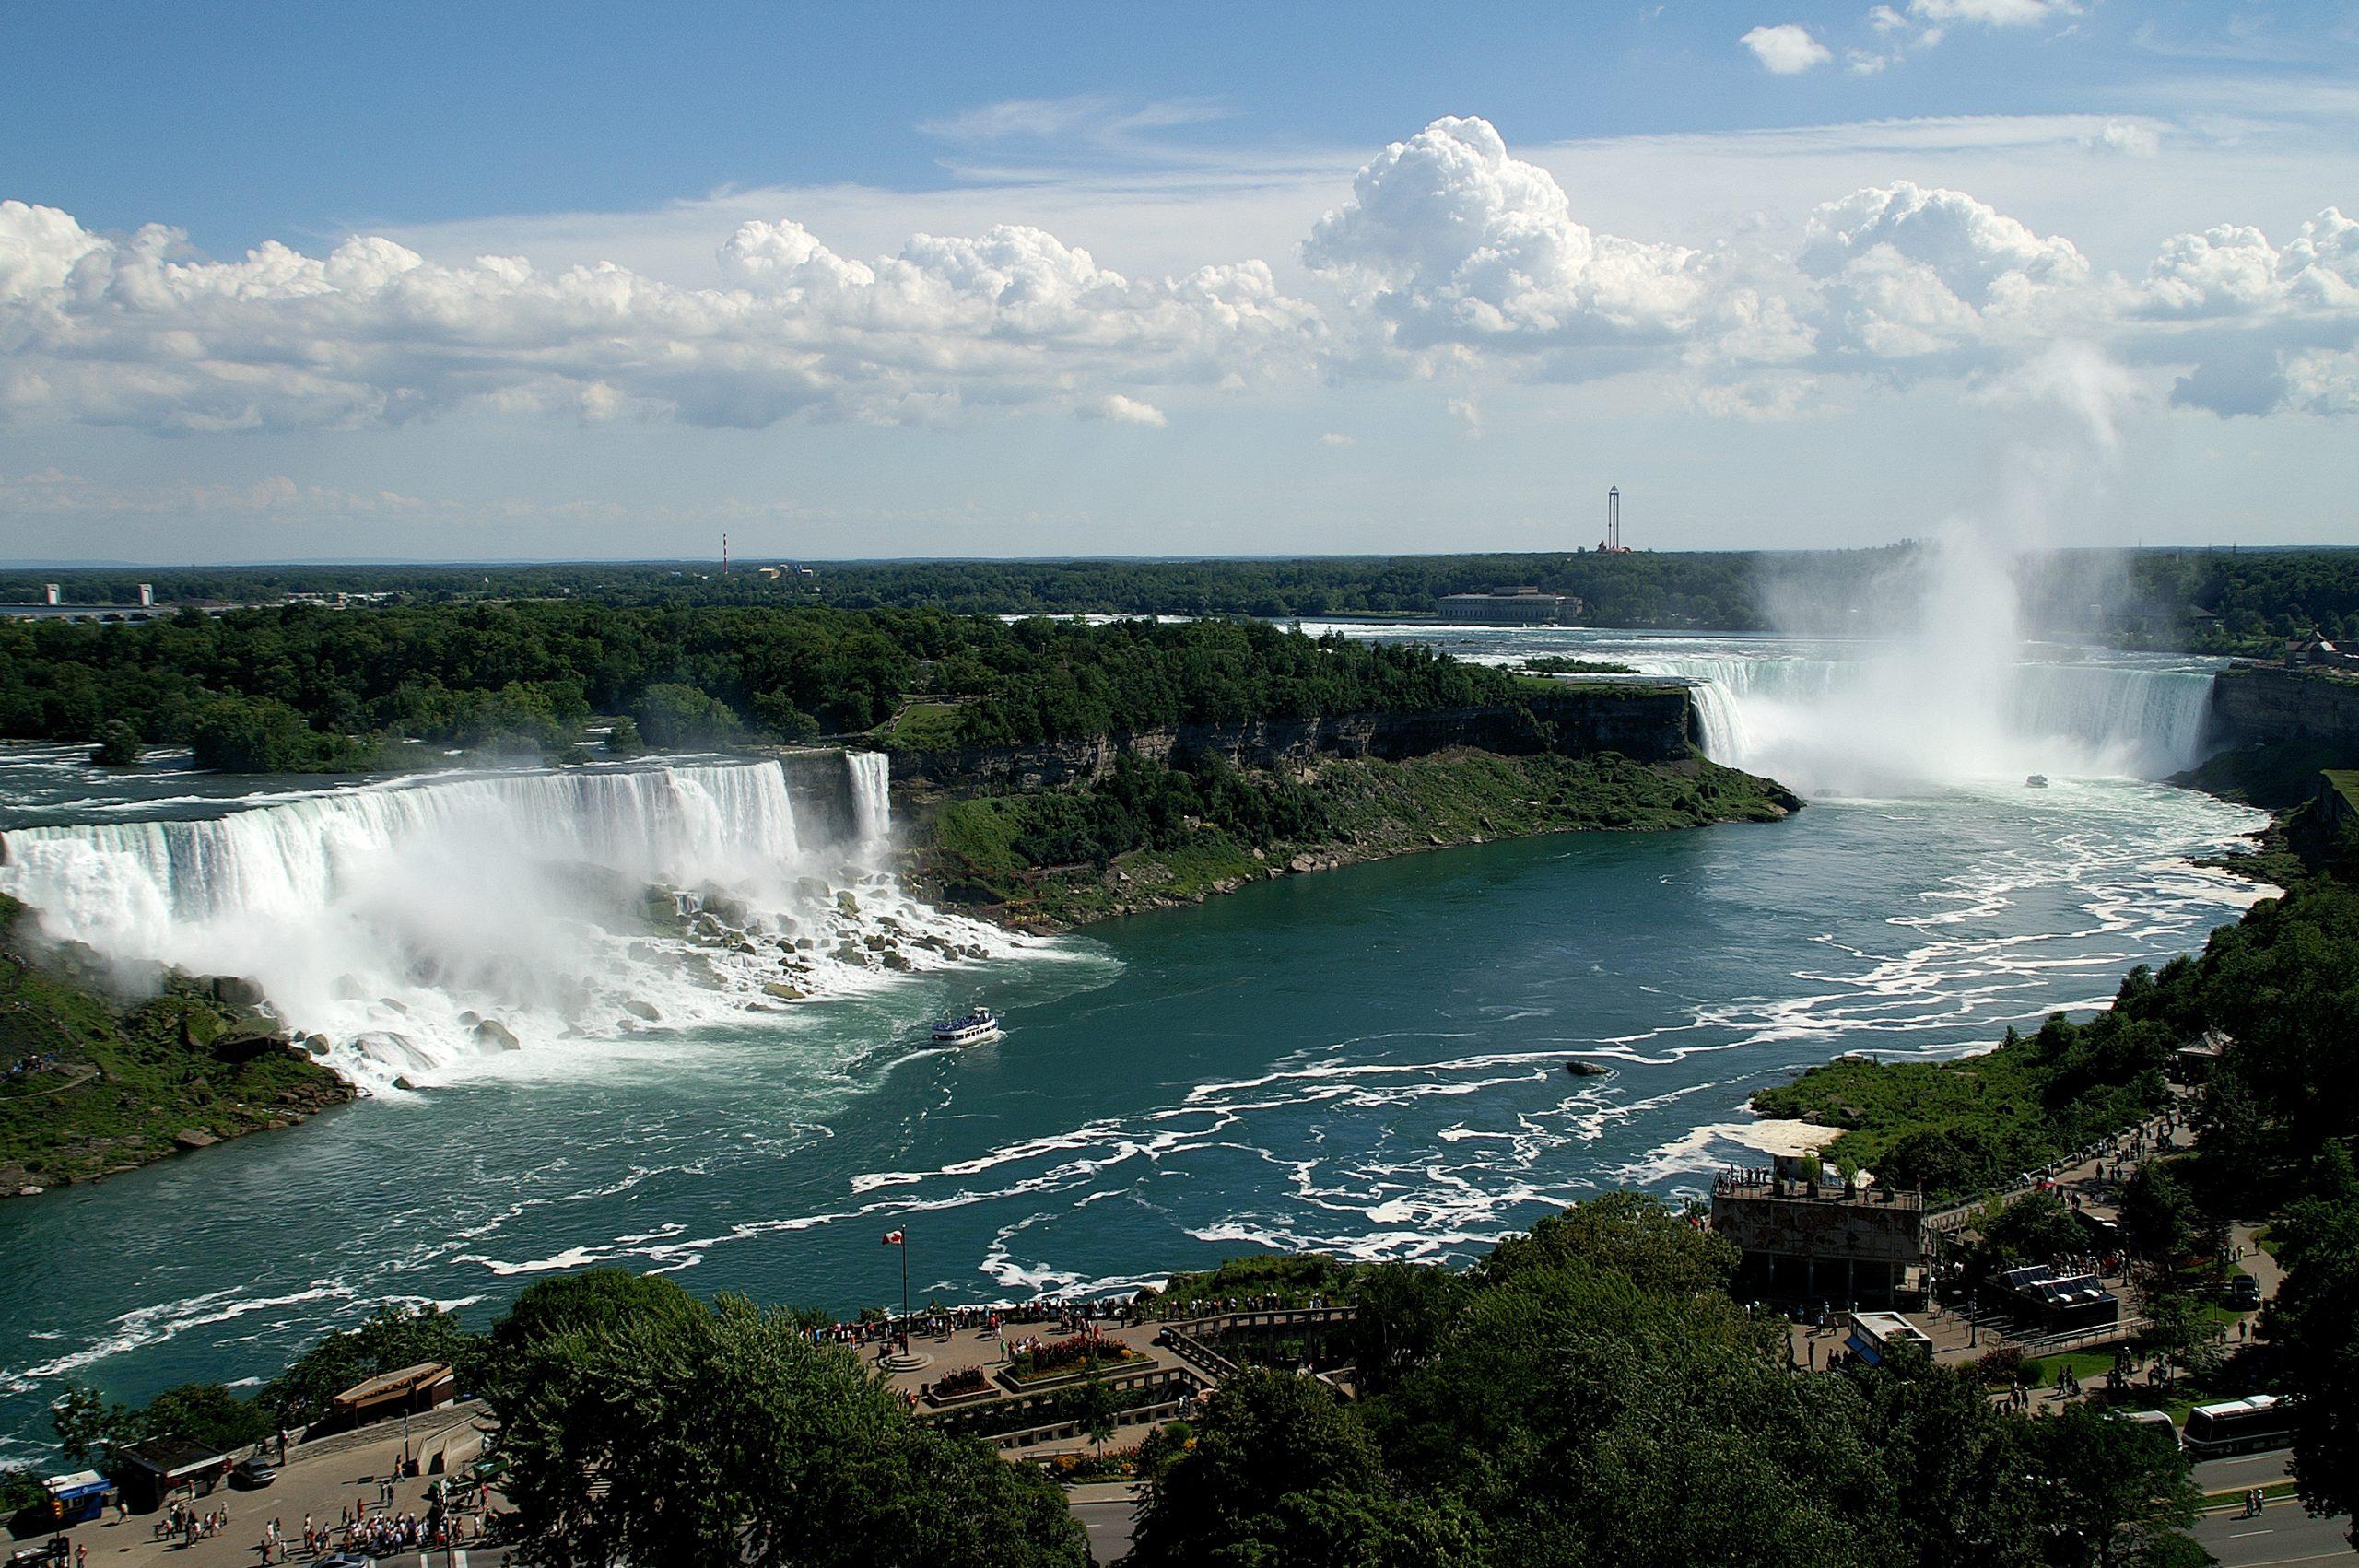 3Falls Niagara scaled #новости 26 мая, Грузия-Канада, День независимости Грузии, Канада, Котэ Абхази, Ниагарский водопад, Нико Абхази